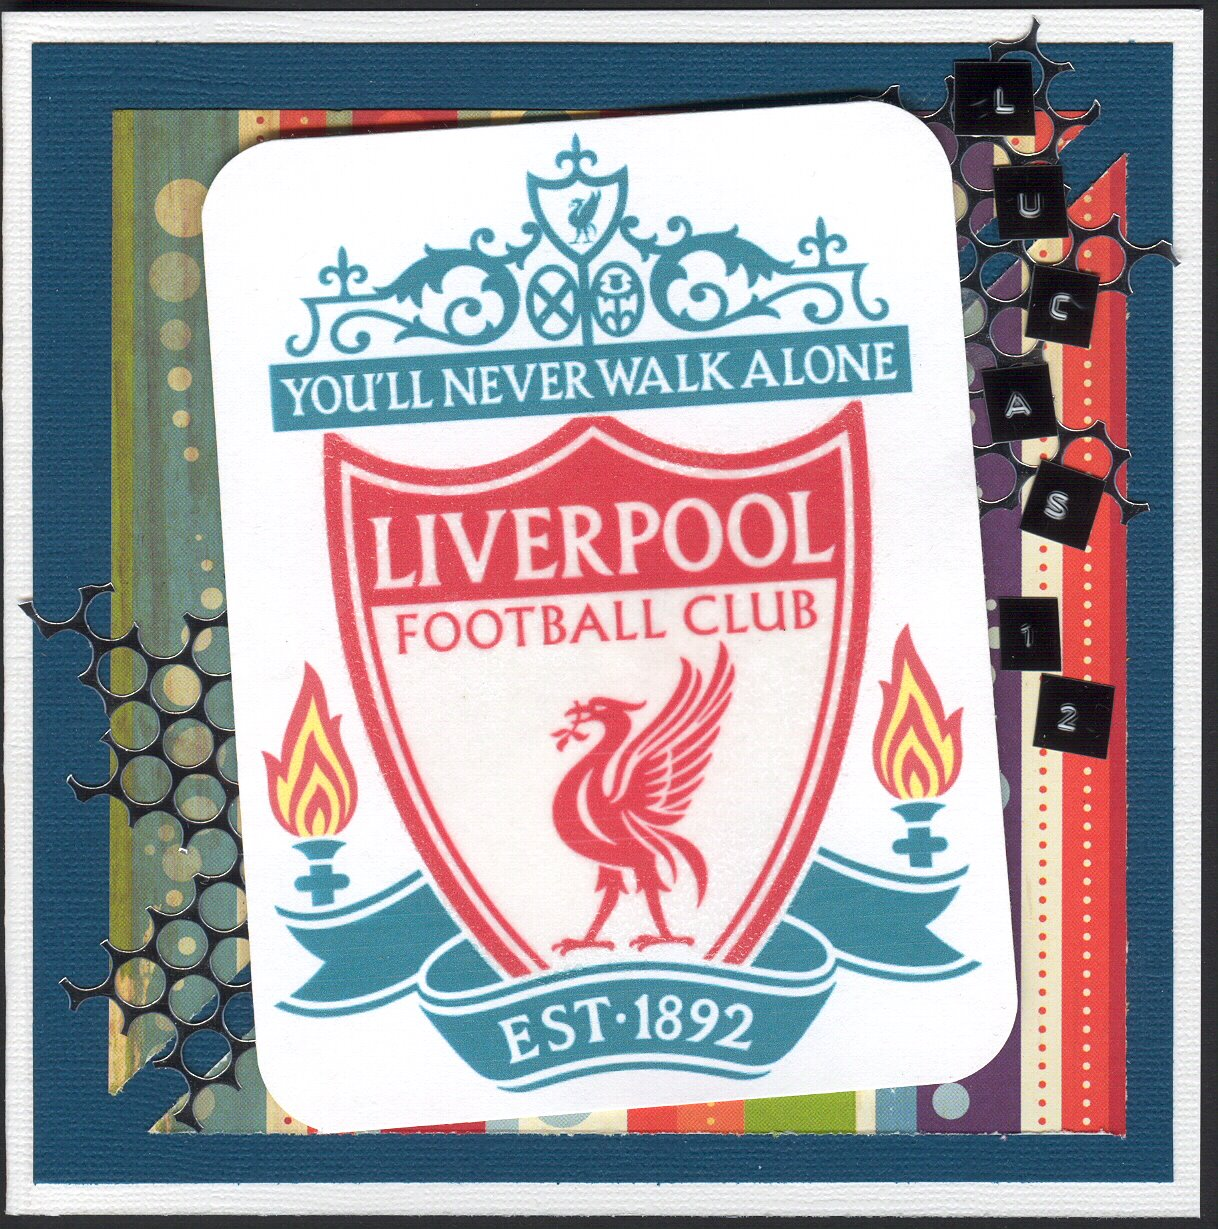 [Lucas+Liverpool+26:4]